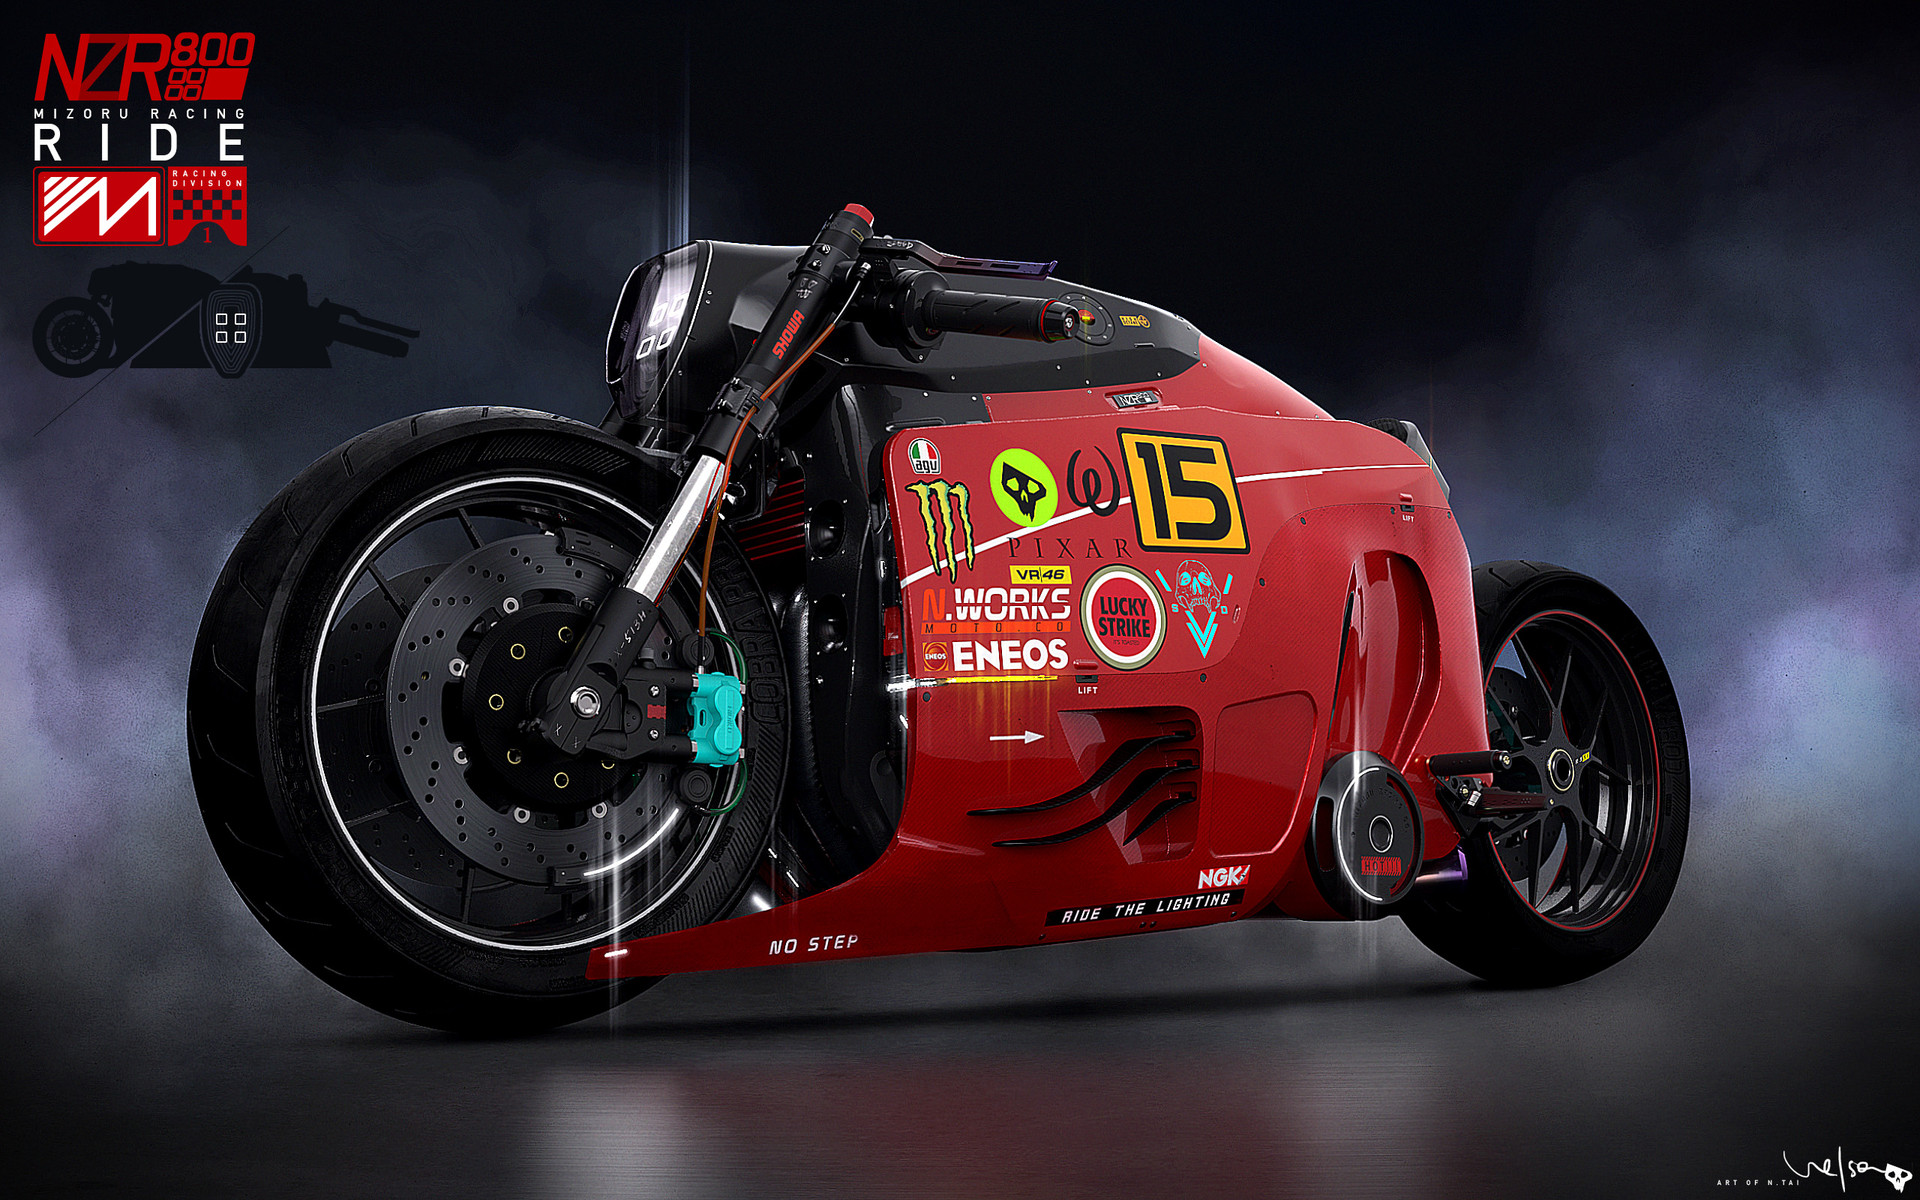 Nelson tai nzr800 dsgn bike 001a